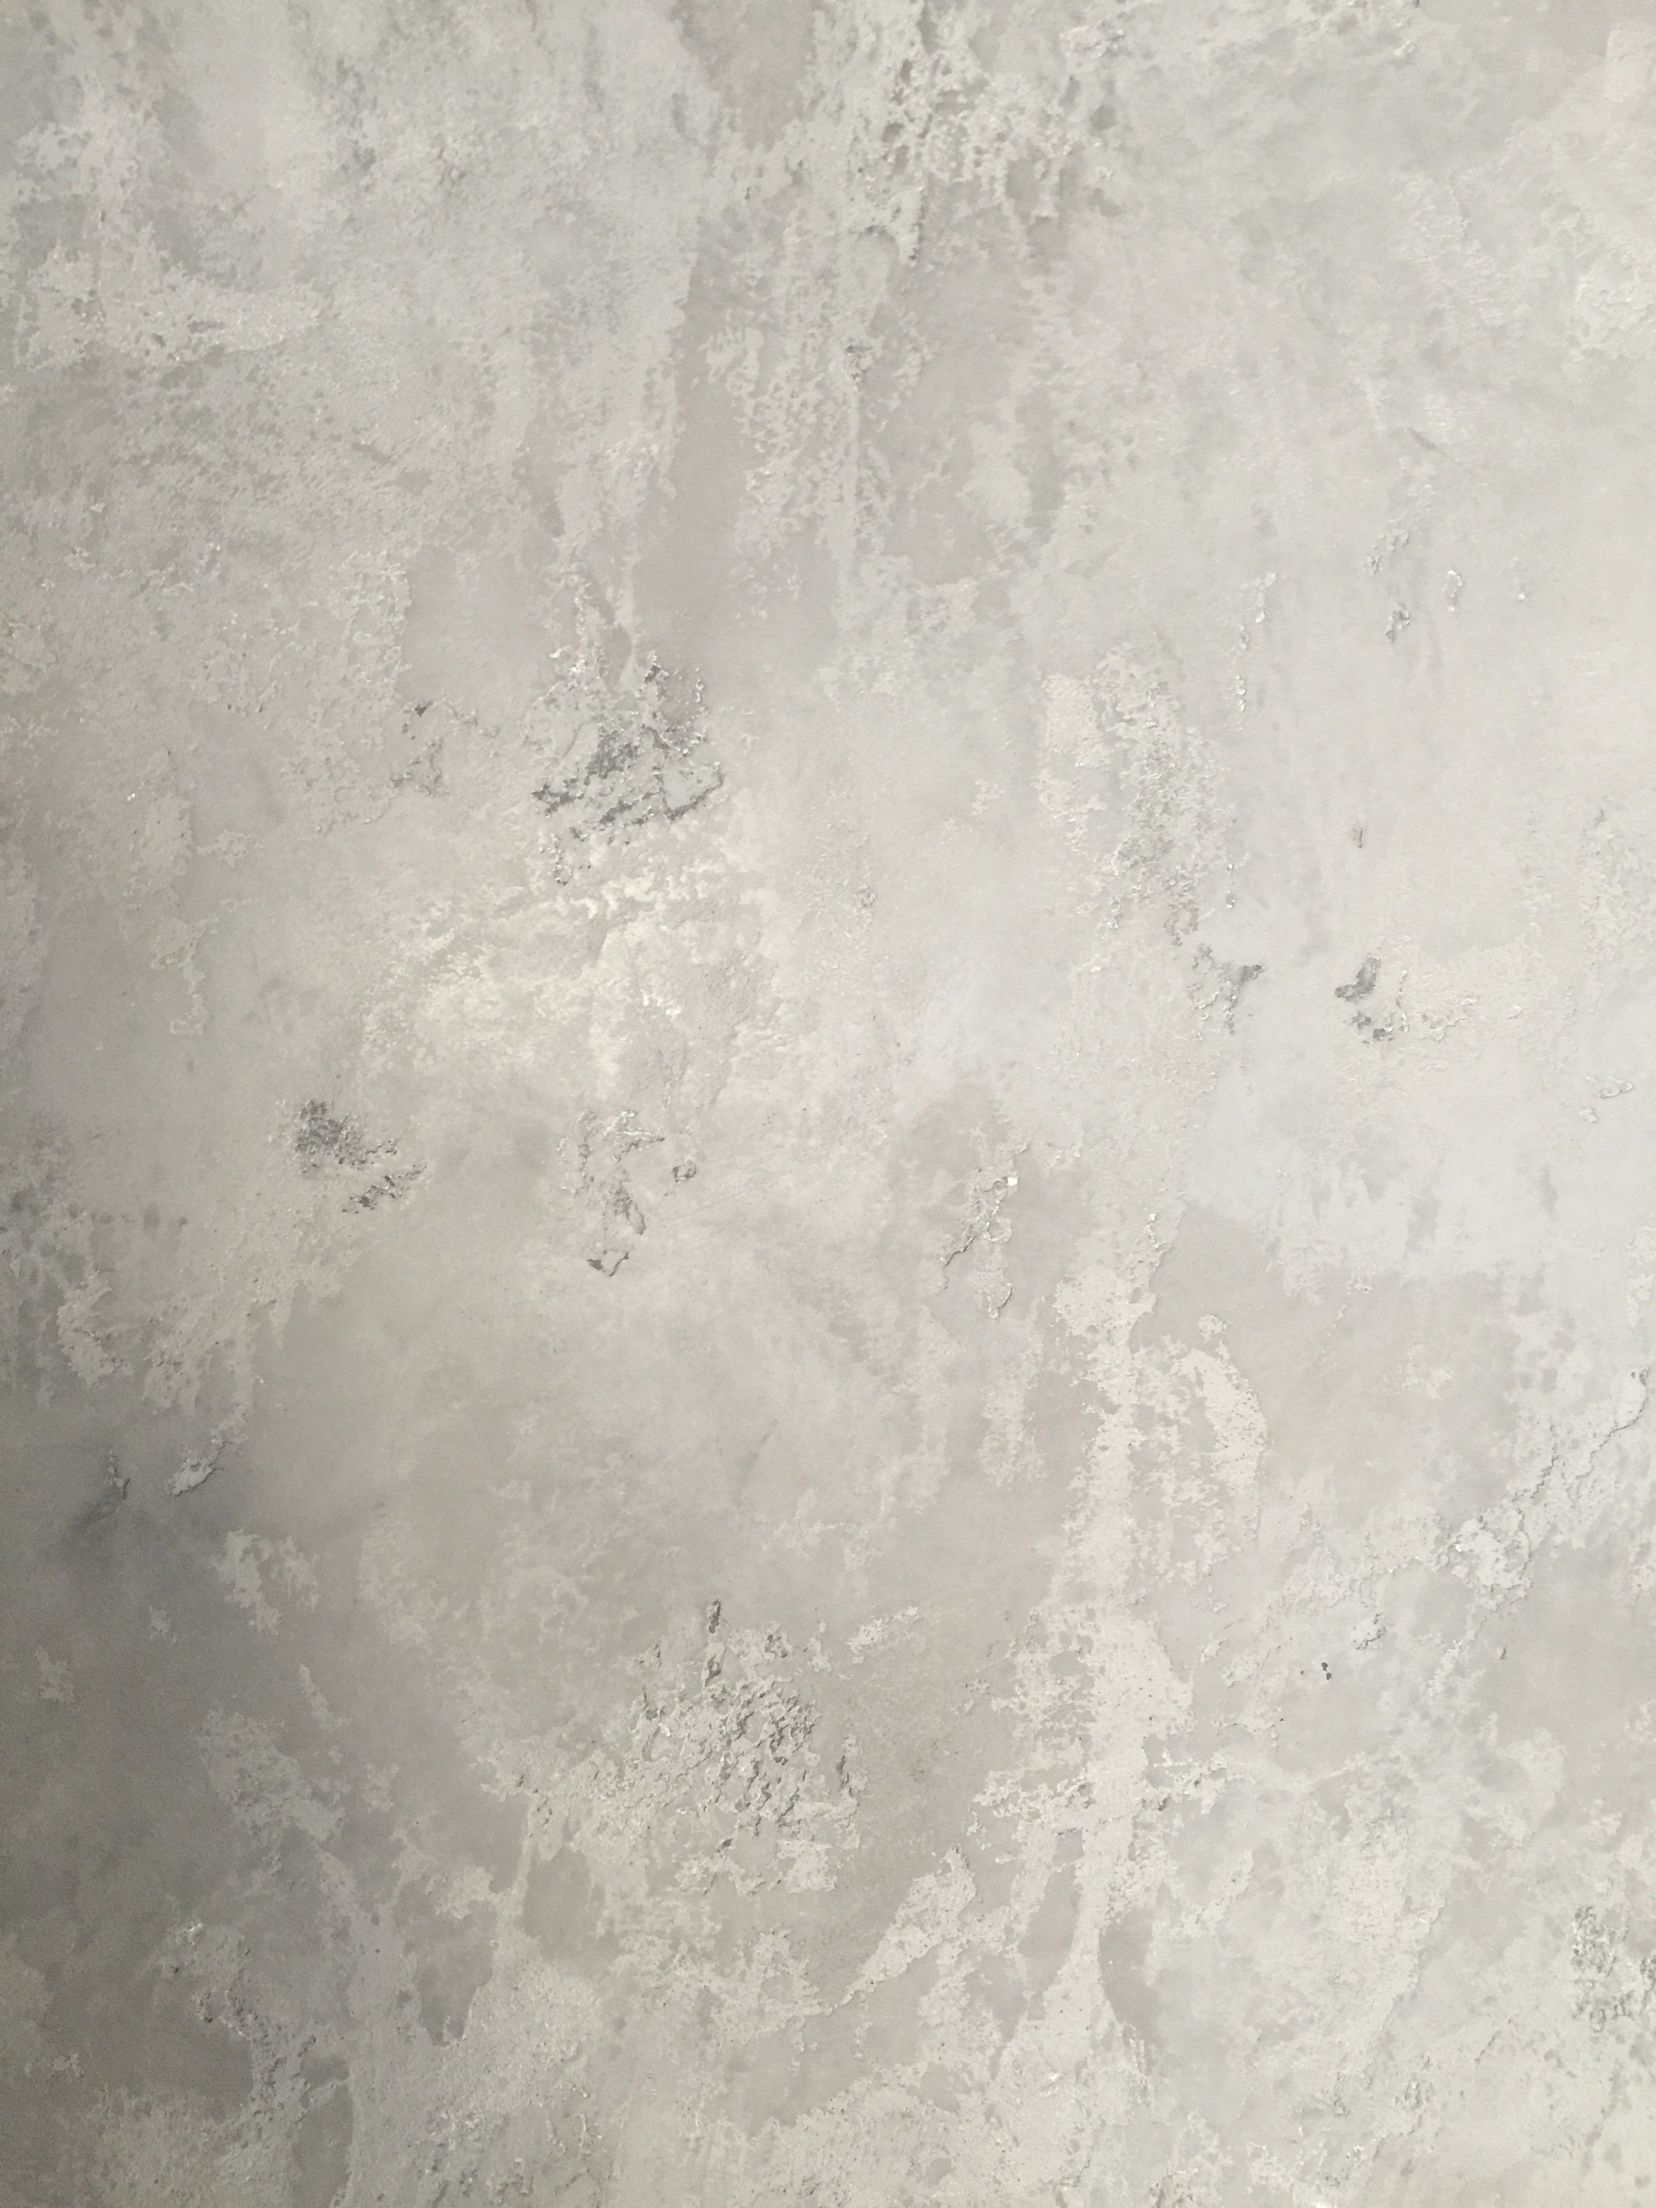 Decorative distressed concrete polished plaster | DIY ...